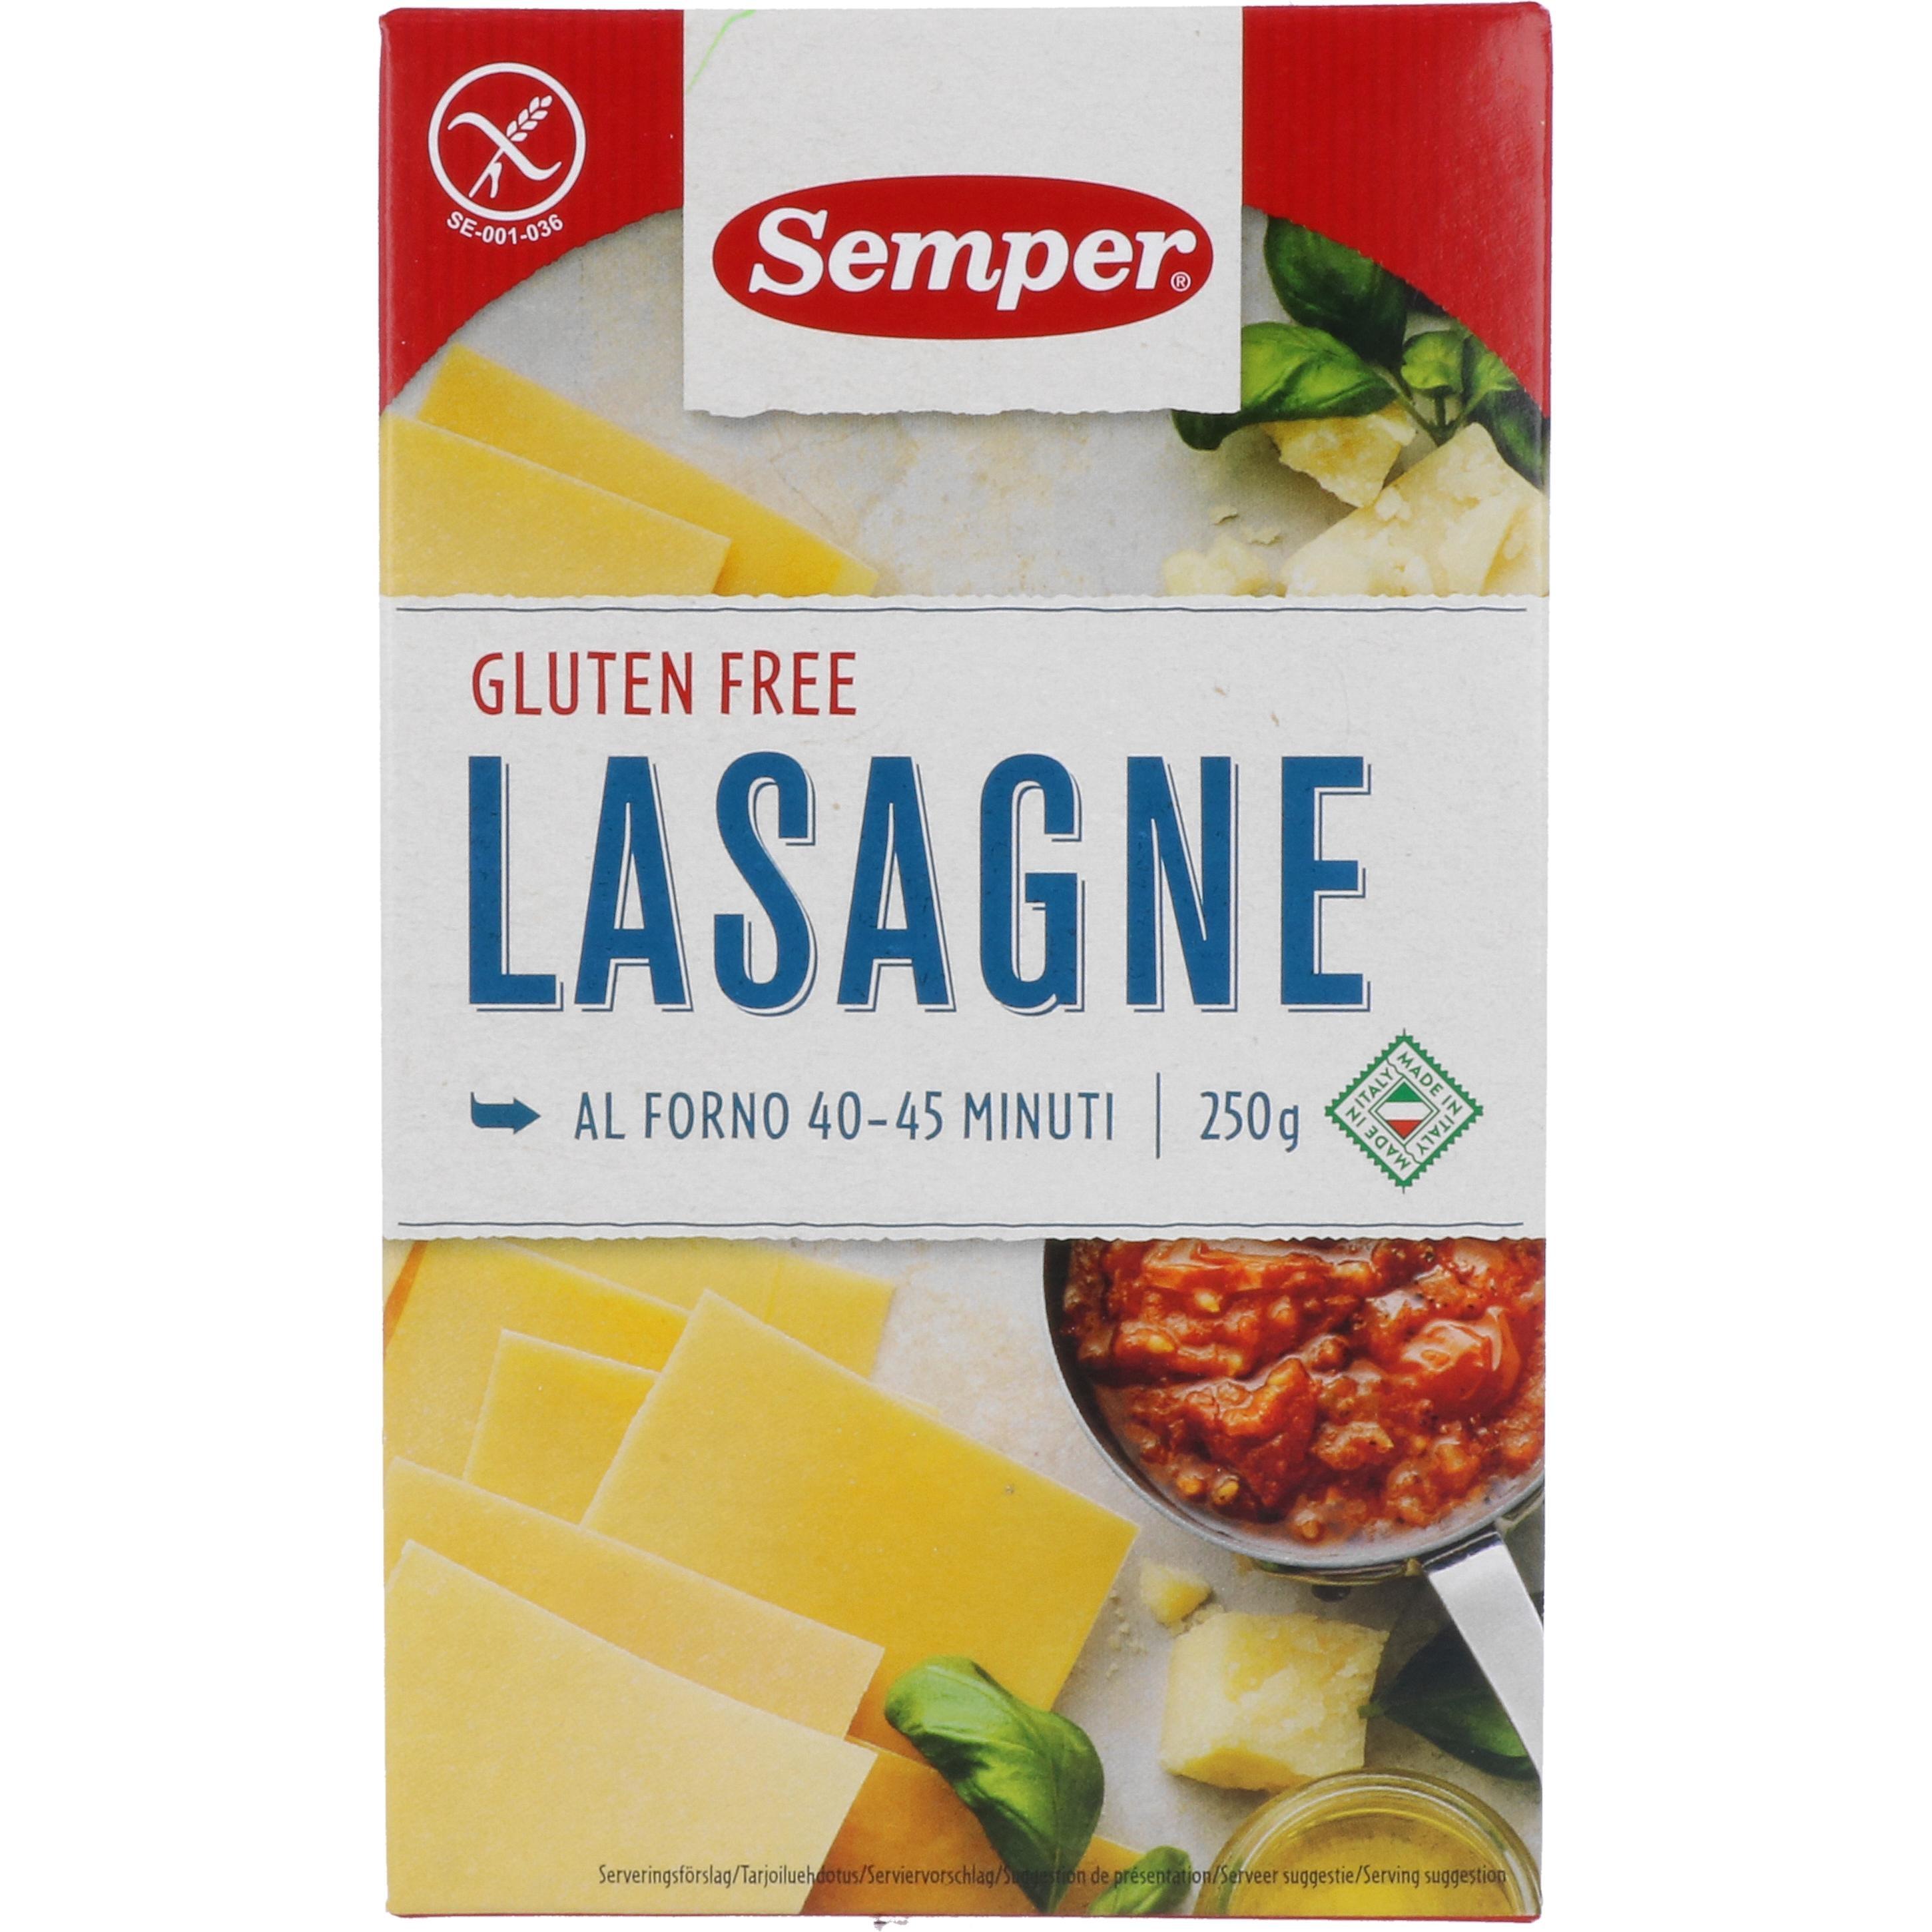 Semper Lasagne 250g